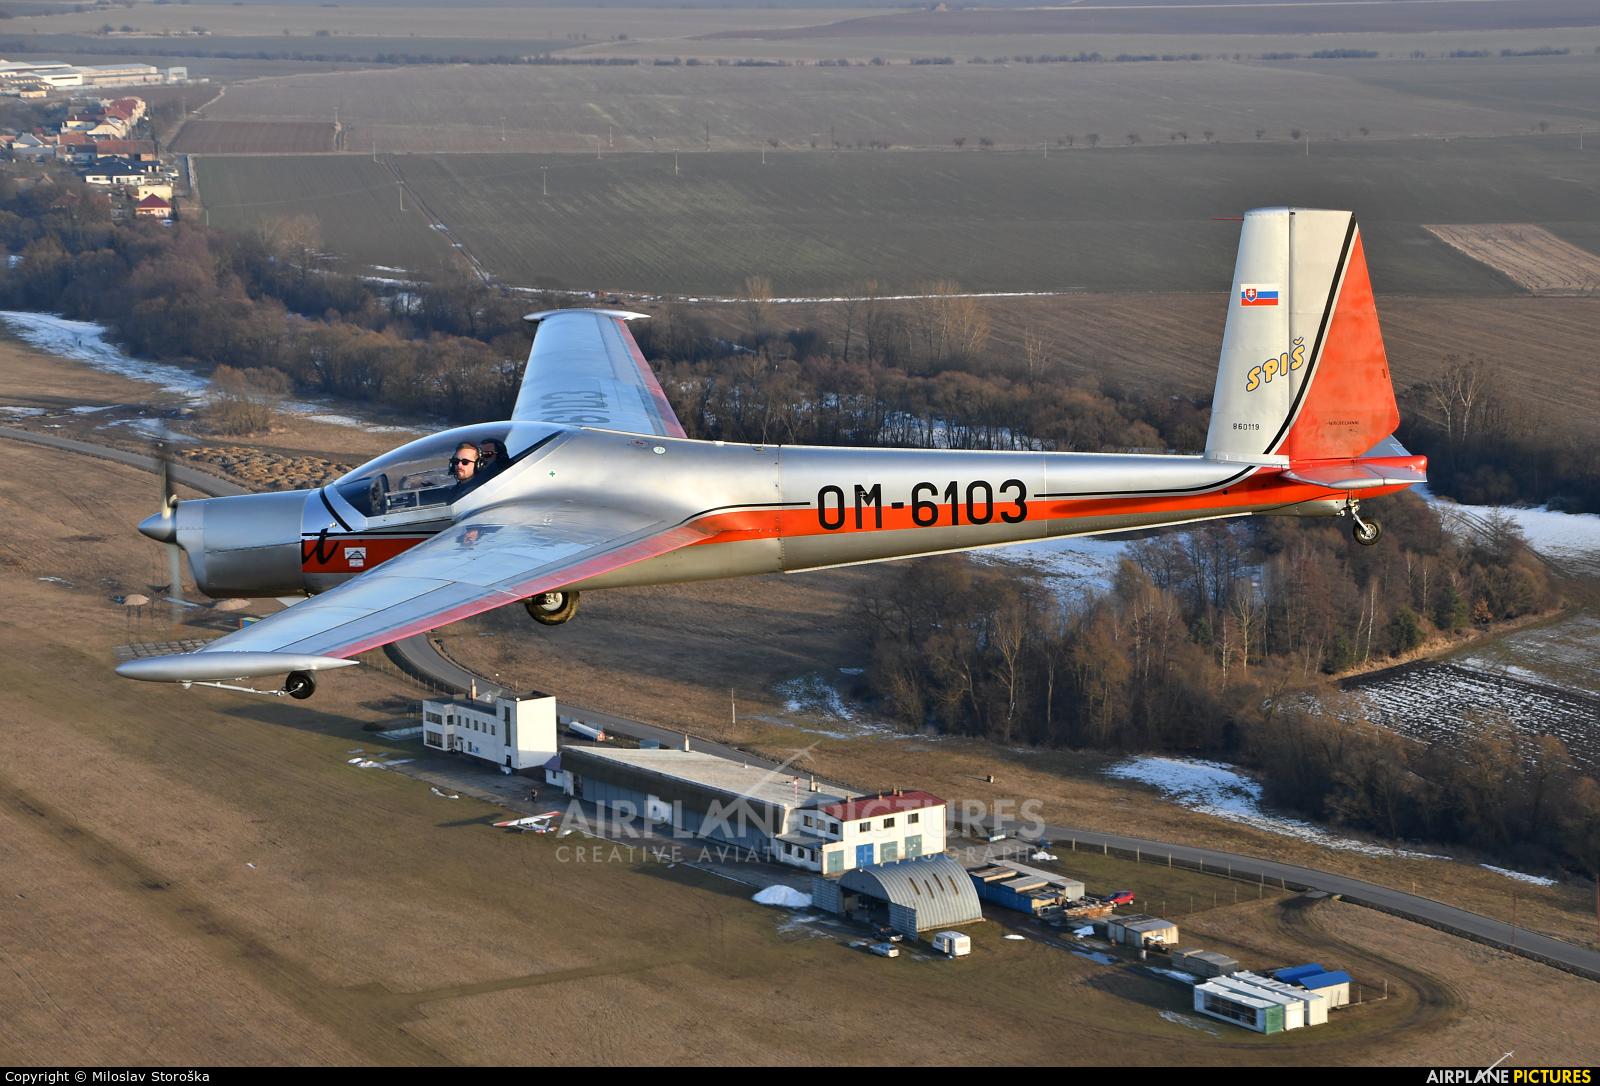 Aeroklub Spišská Nová Ves OM-6103 aircraft at In Flight - Slovakia